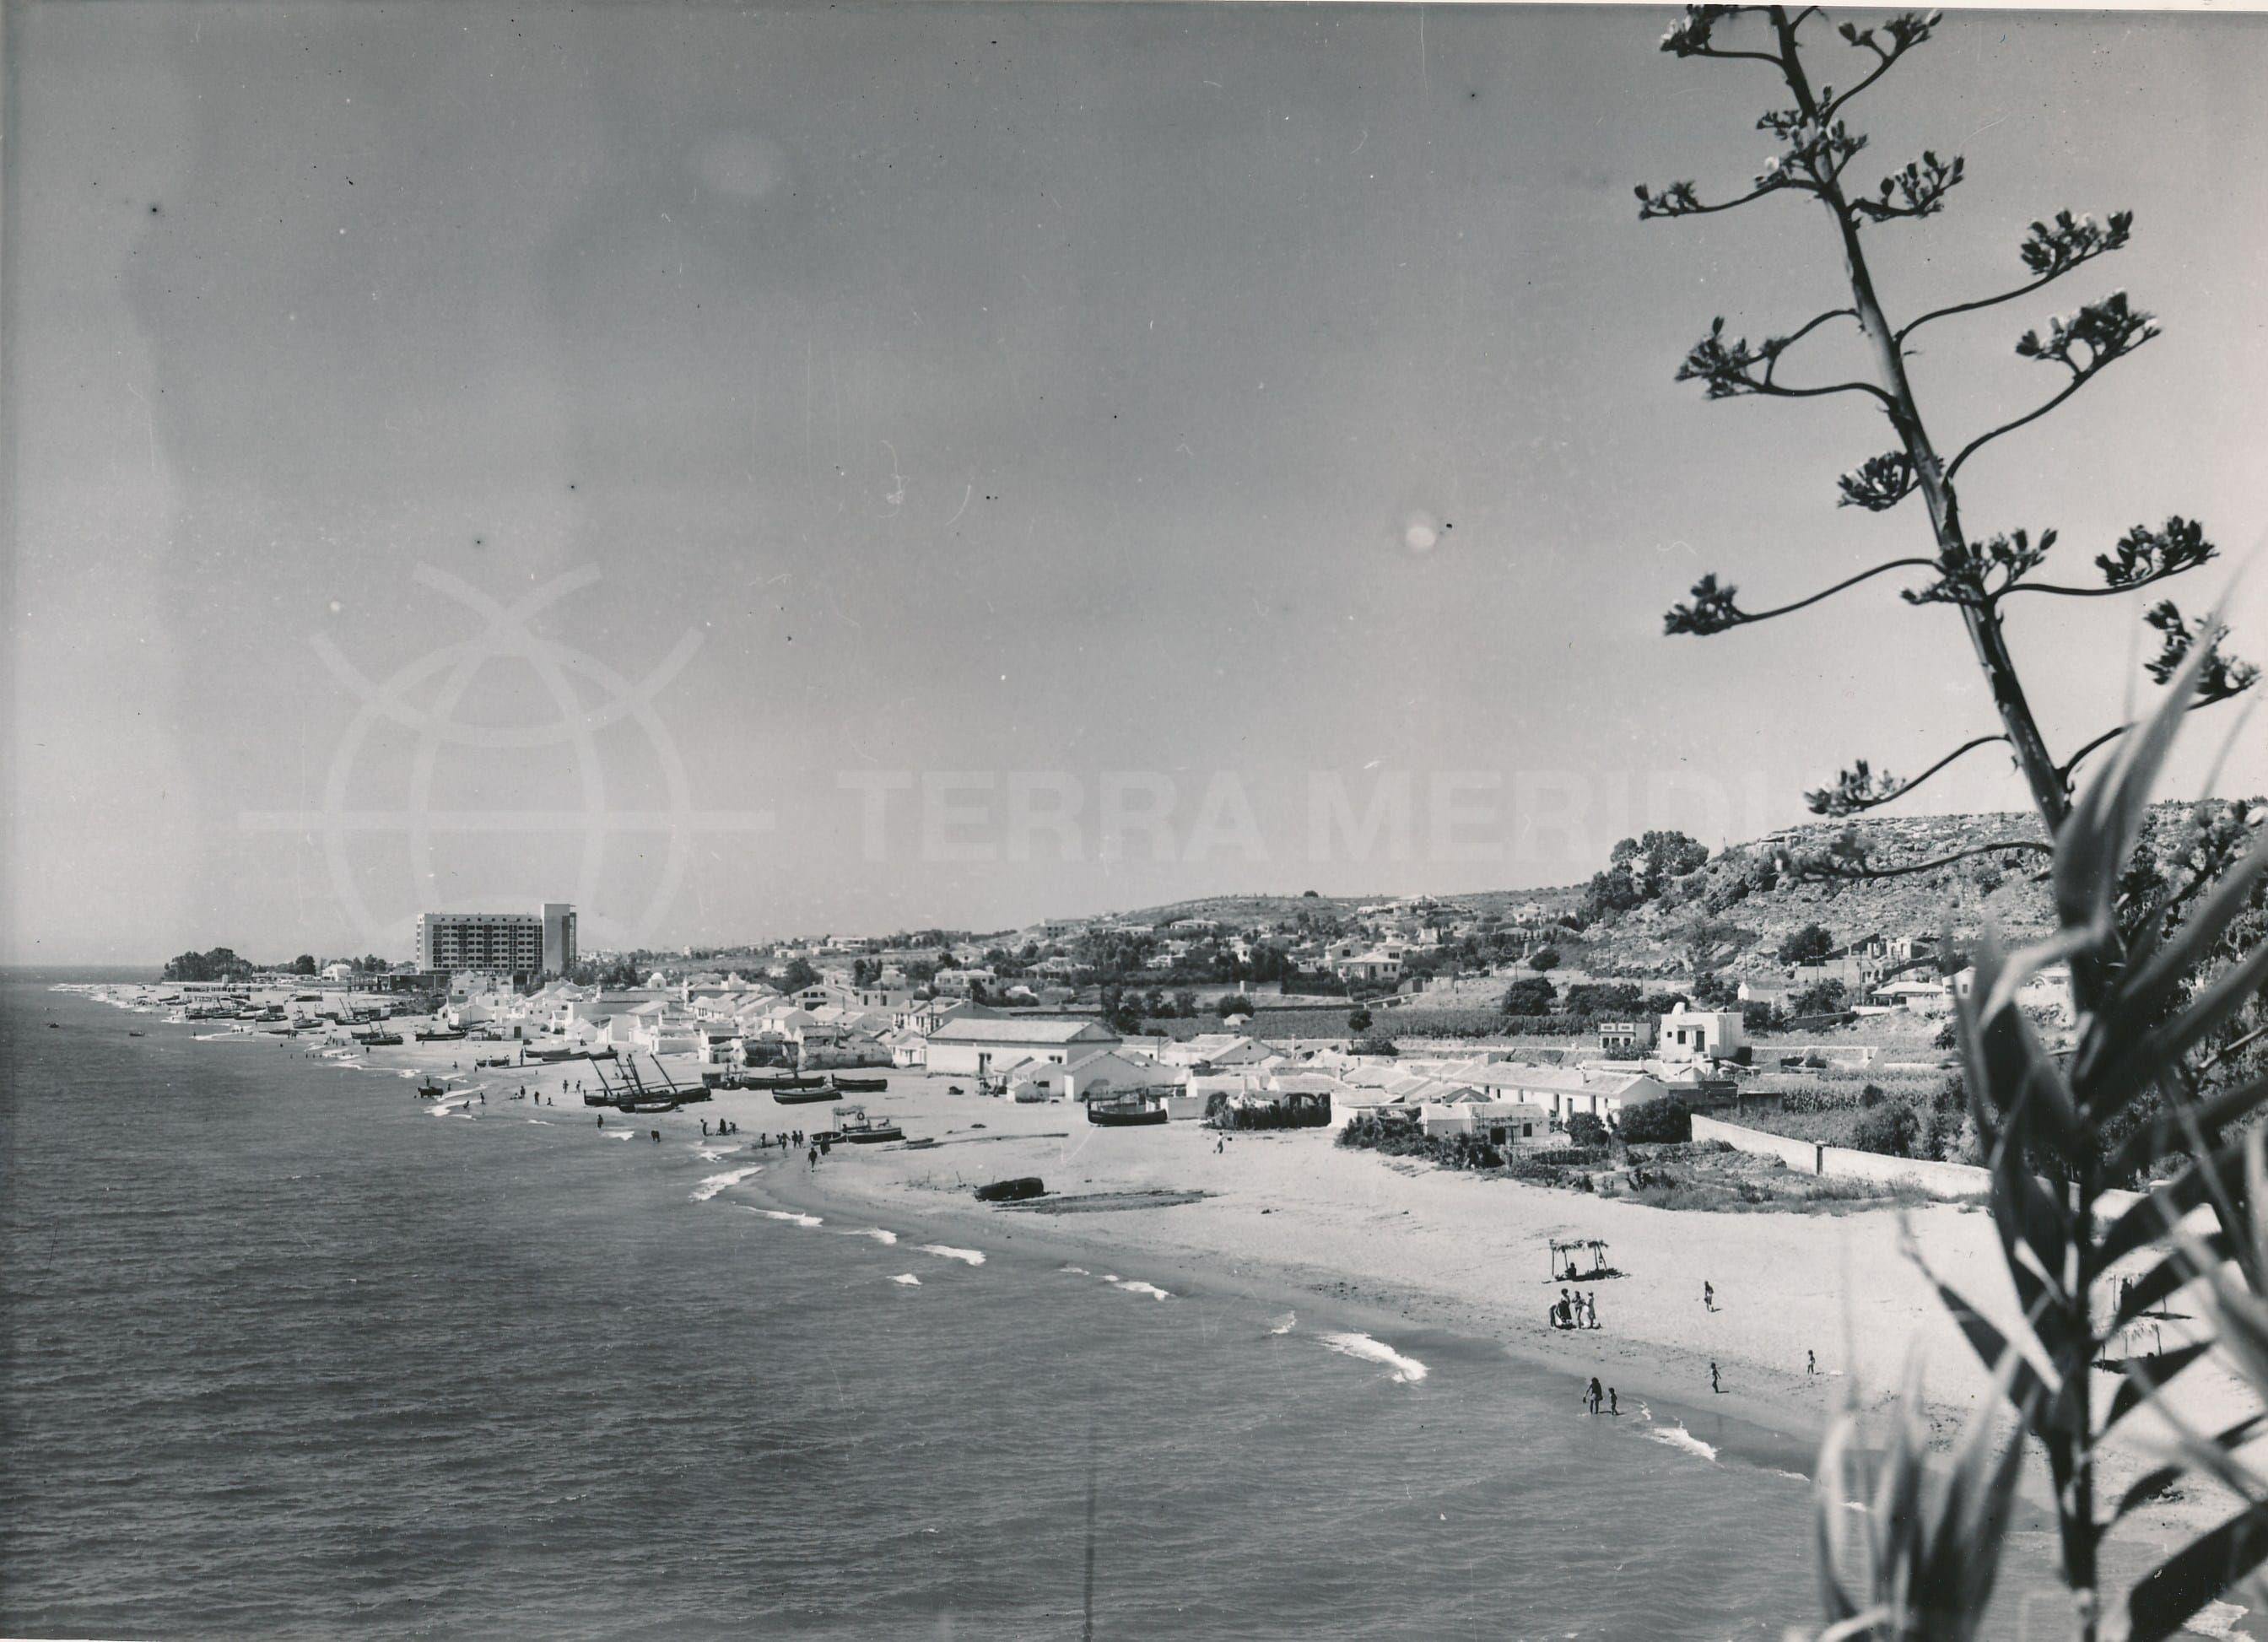 Une brève histoire de la Costa del Sol